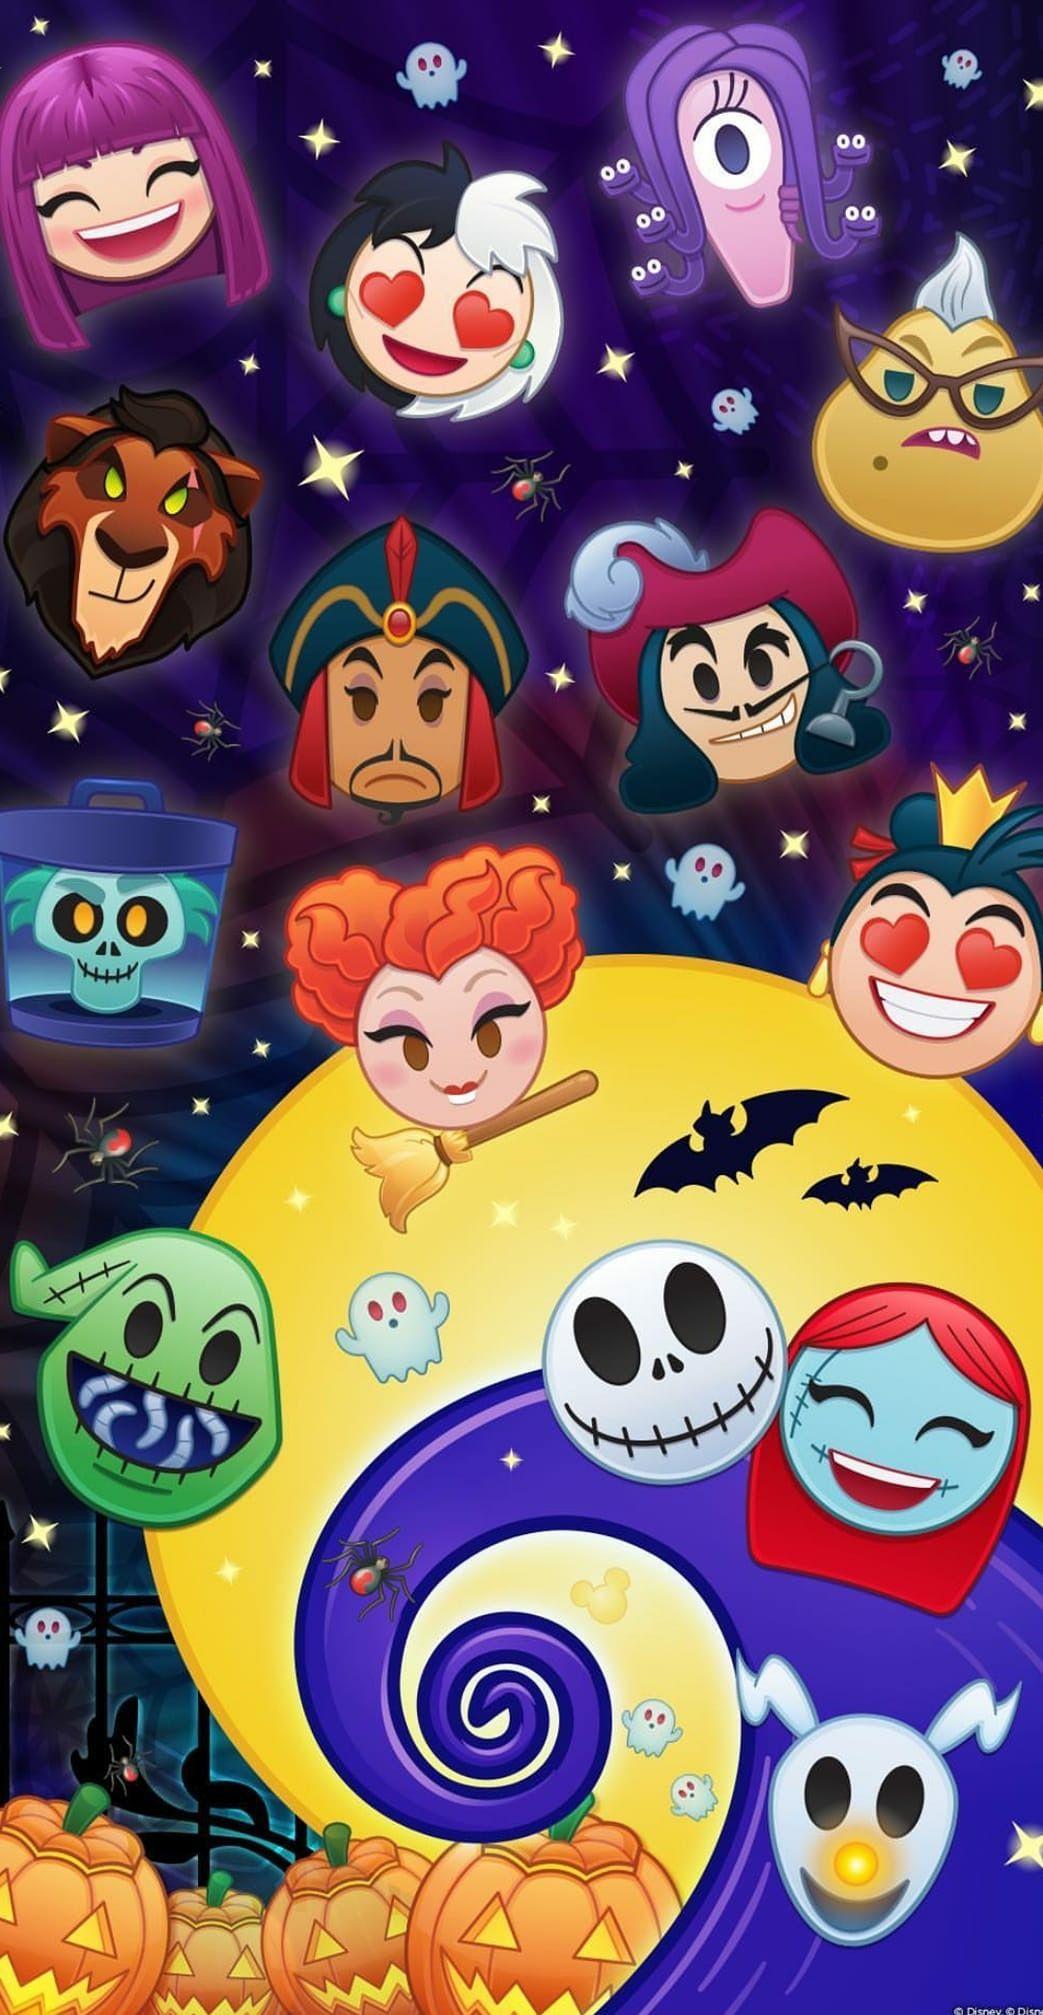 Pin De Wm En Villians Pantallas De Halloween Fondo De Pantalla Halloween Fondos De Halloween